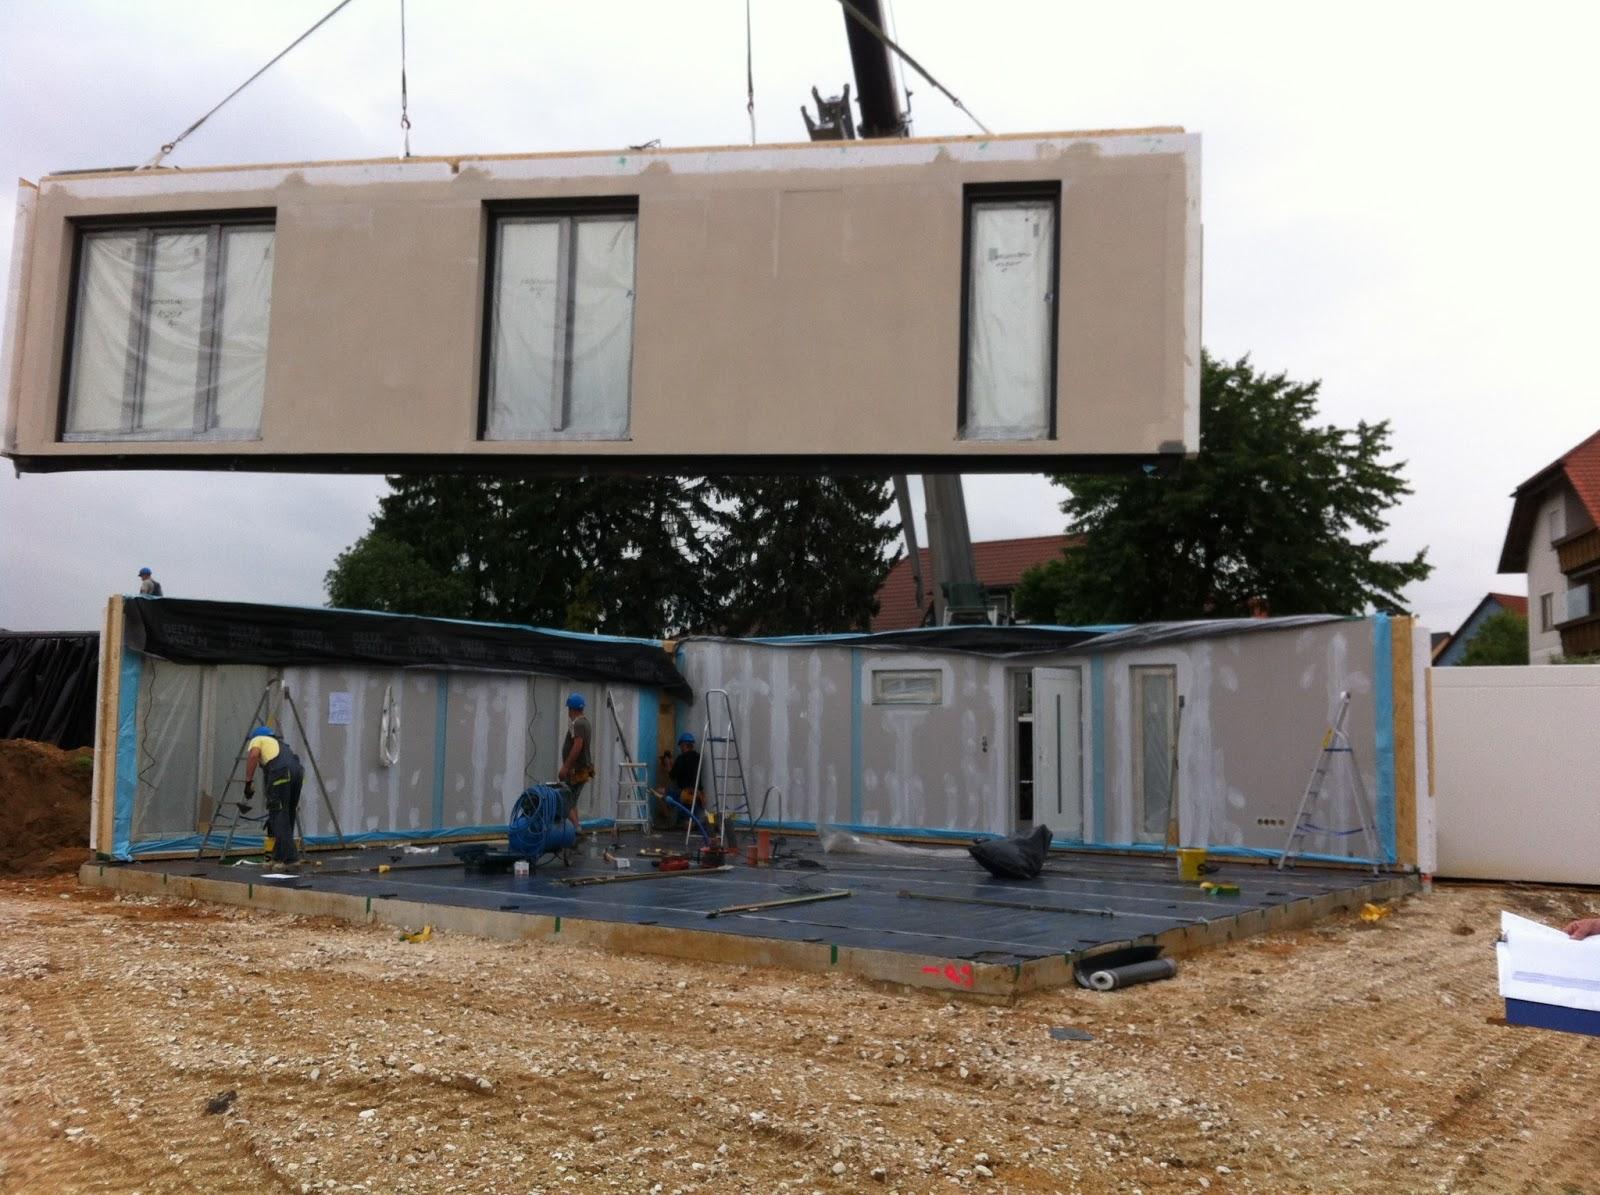 bauen mit dan wood park 151w als freie planung kfw 55 juni 2013. Black Bedroom Furniture Sets. Home Design Ideas